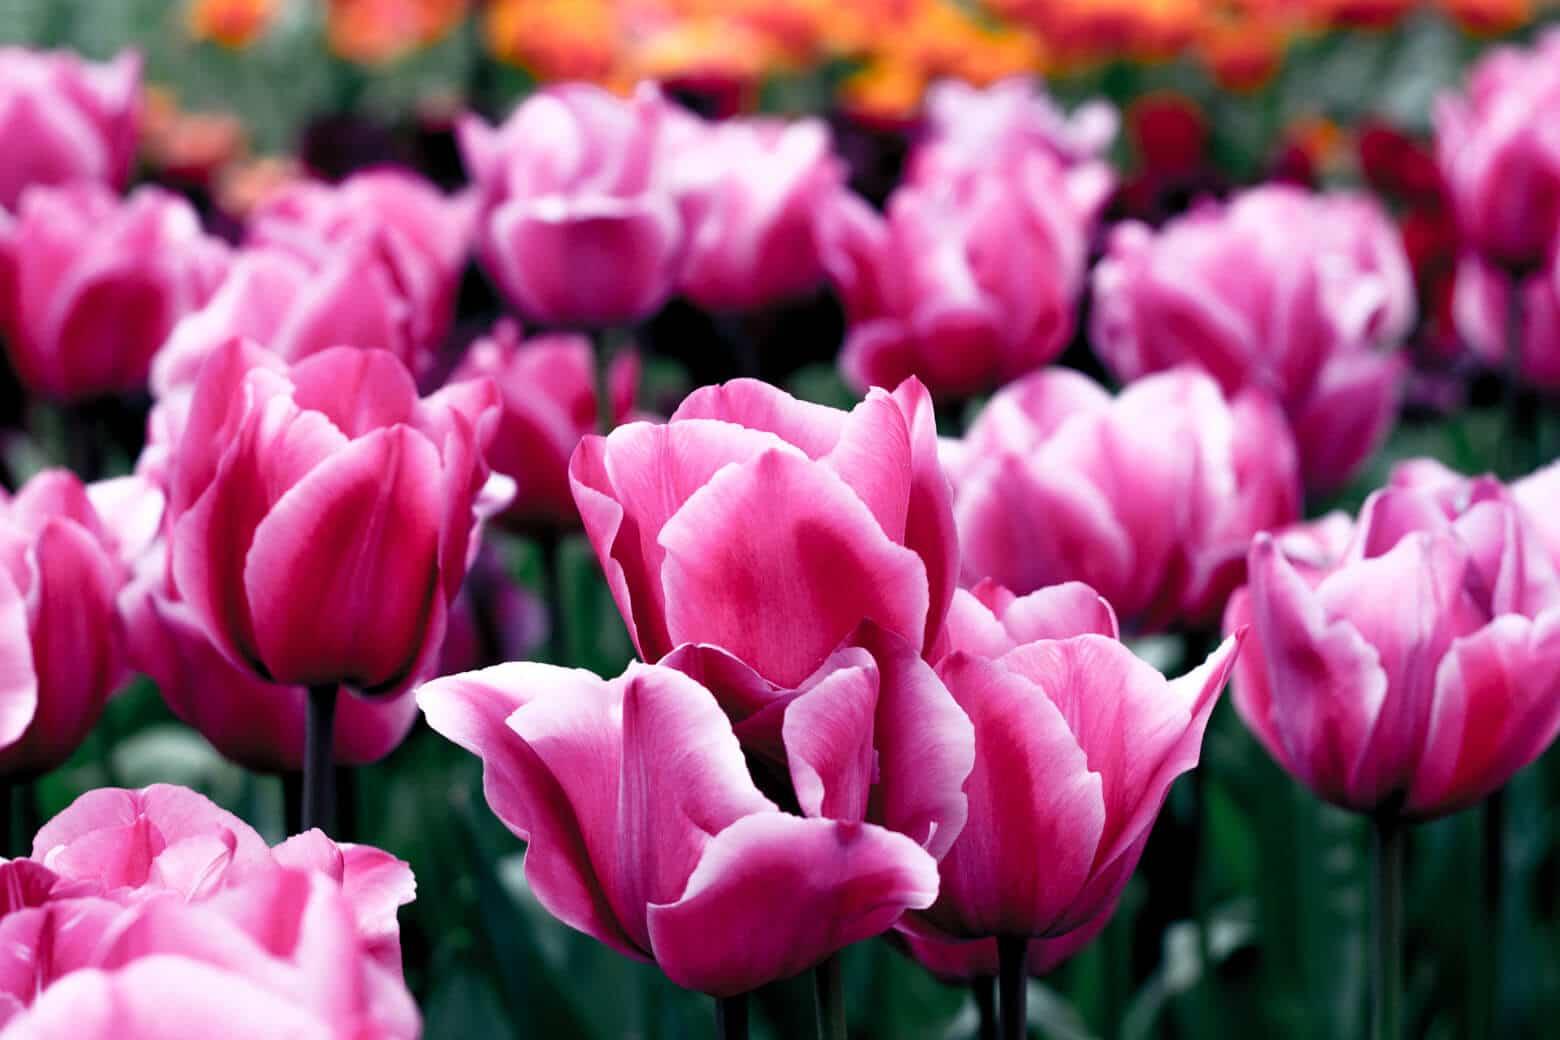 Pink & White Dutch Tulips